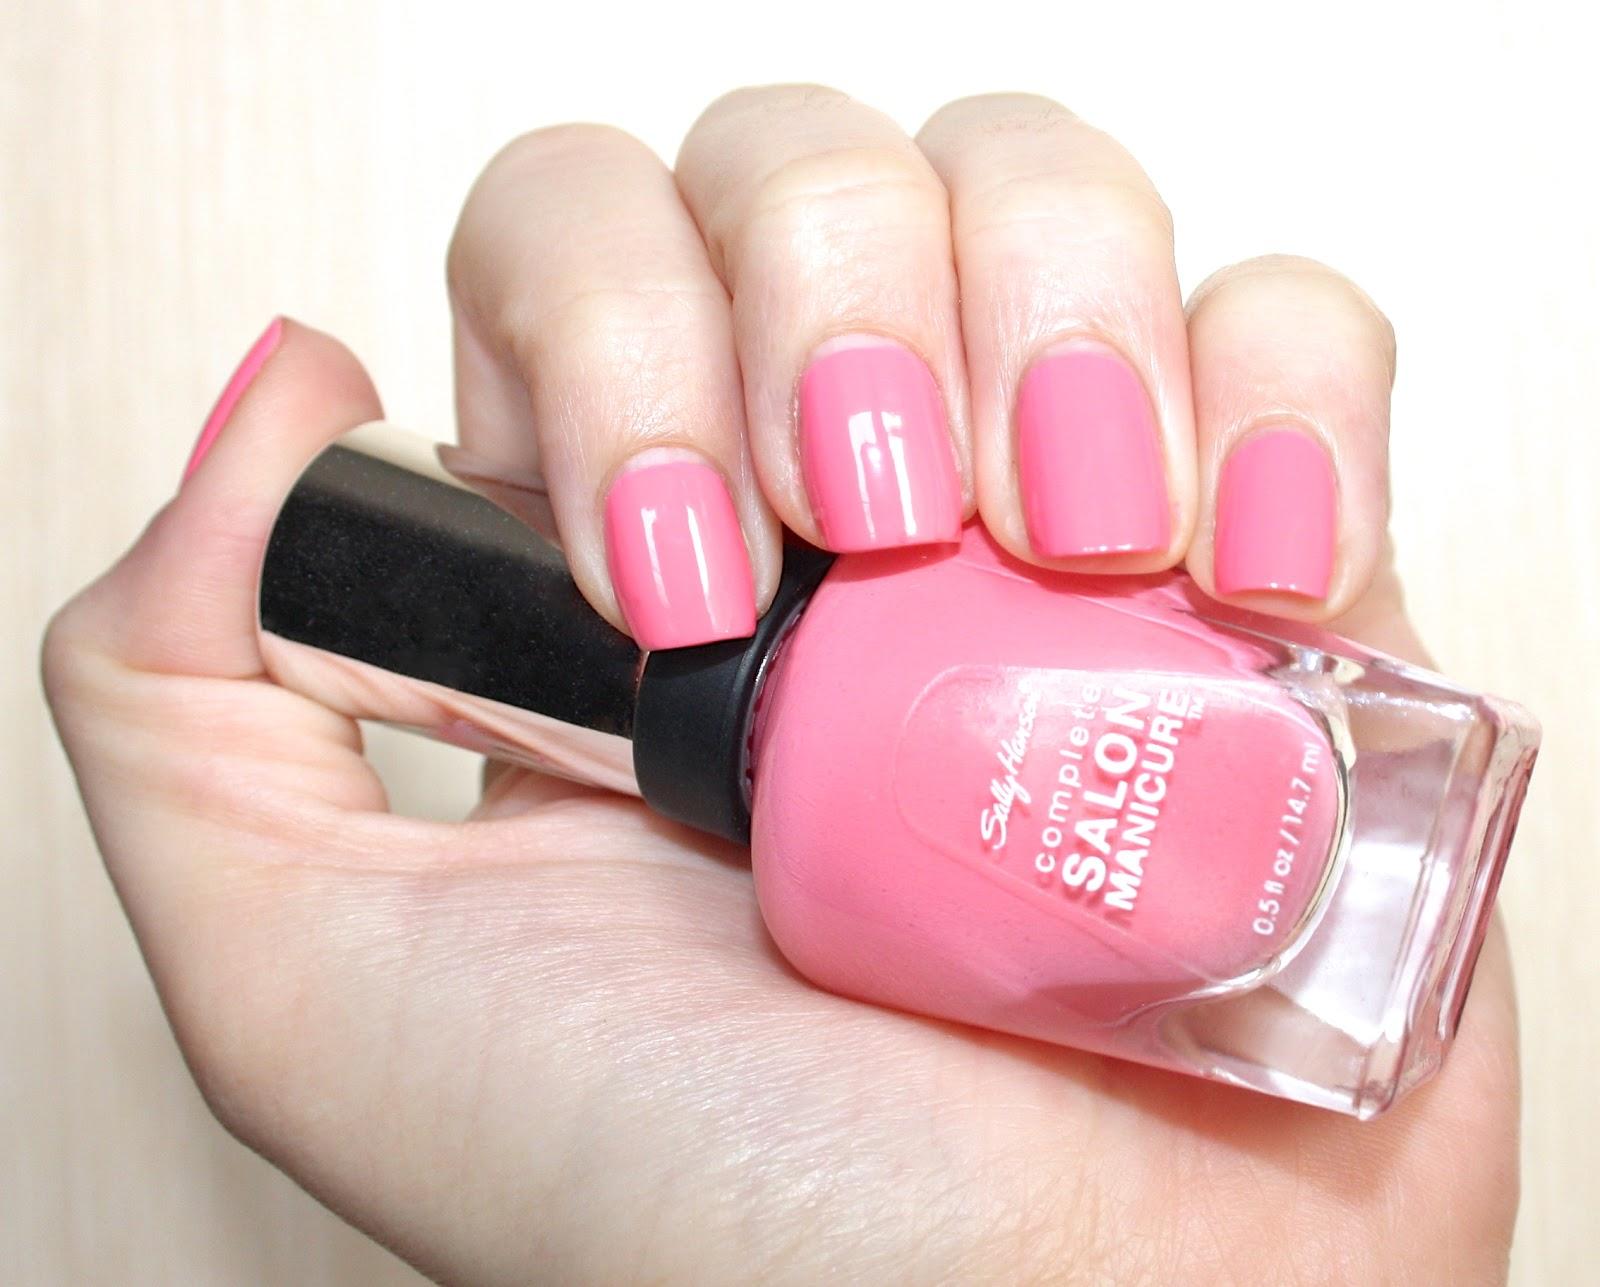 Notd sally hansen complete salon manicure in 510 i pink i for Salon manicure